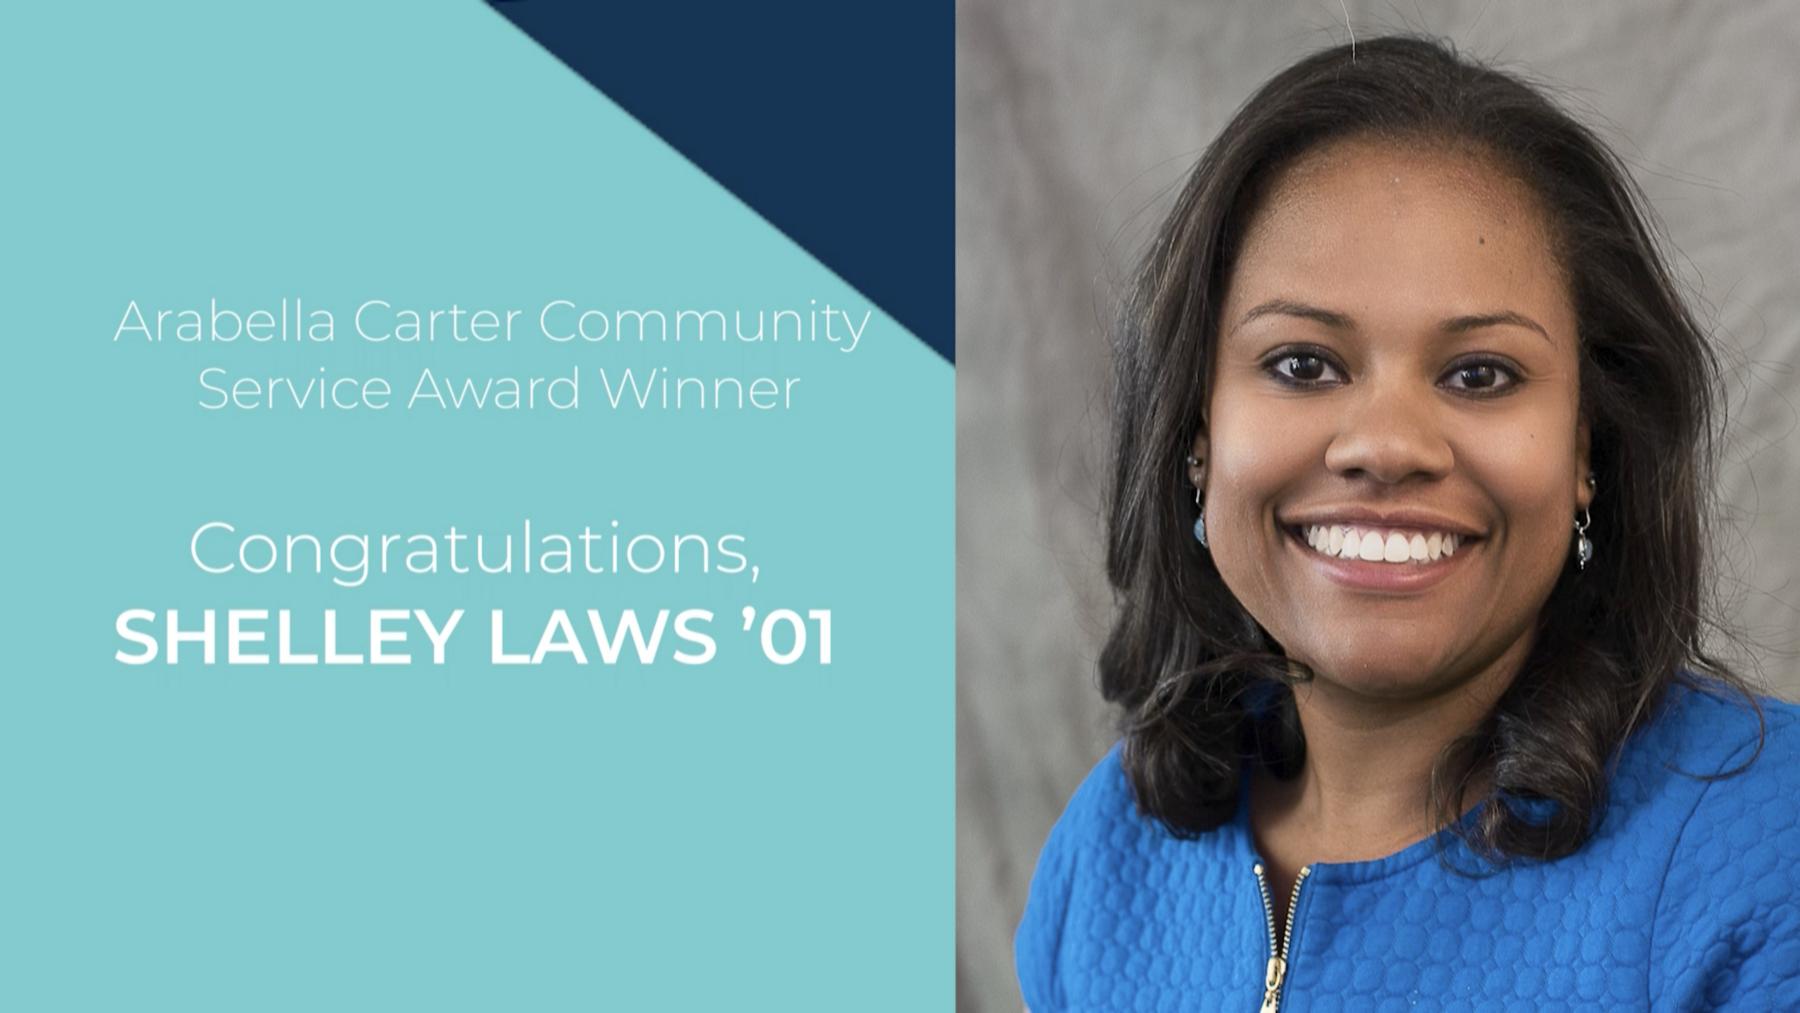 Congratulations, Shelley Laws '01